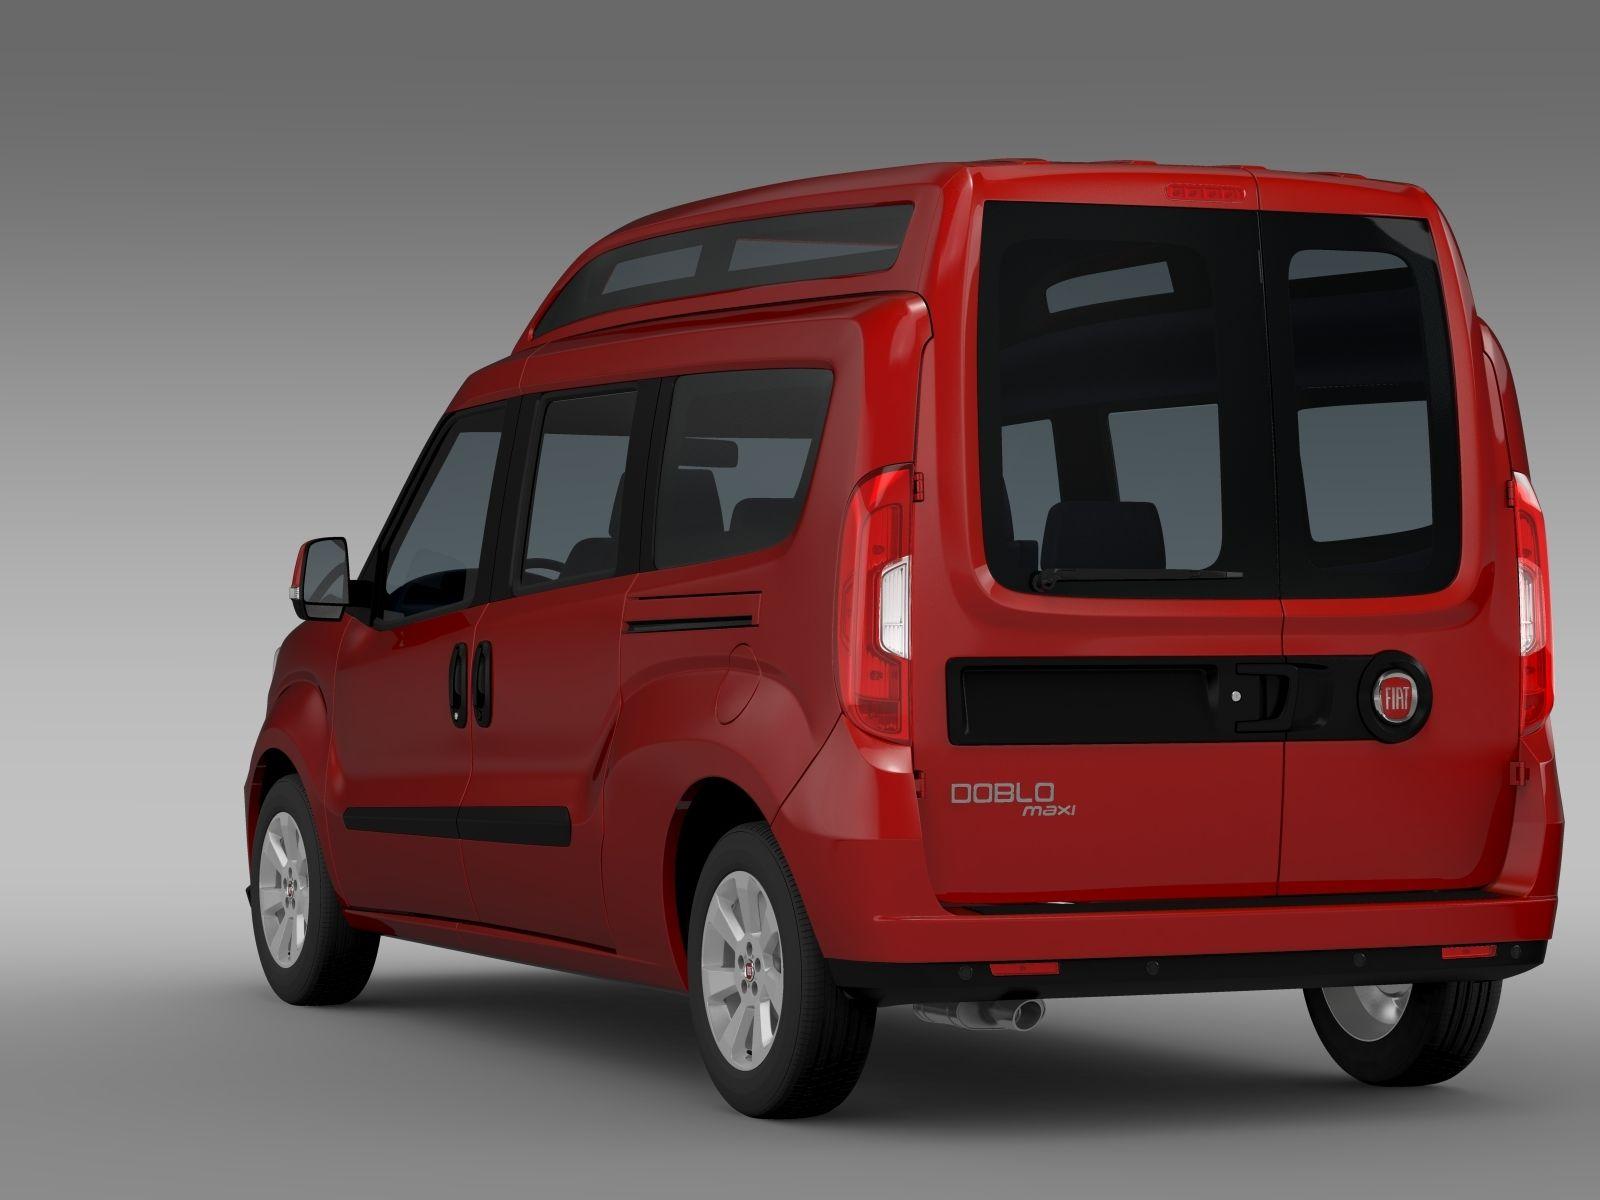 Fiat Doblo Highroof Maxi 263 2015 Fiat Doblo Fiat Maxi